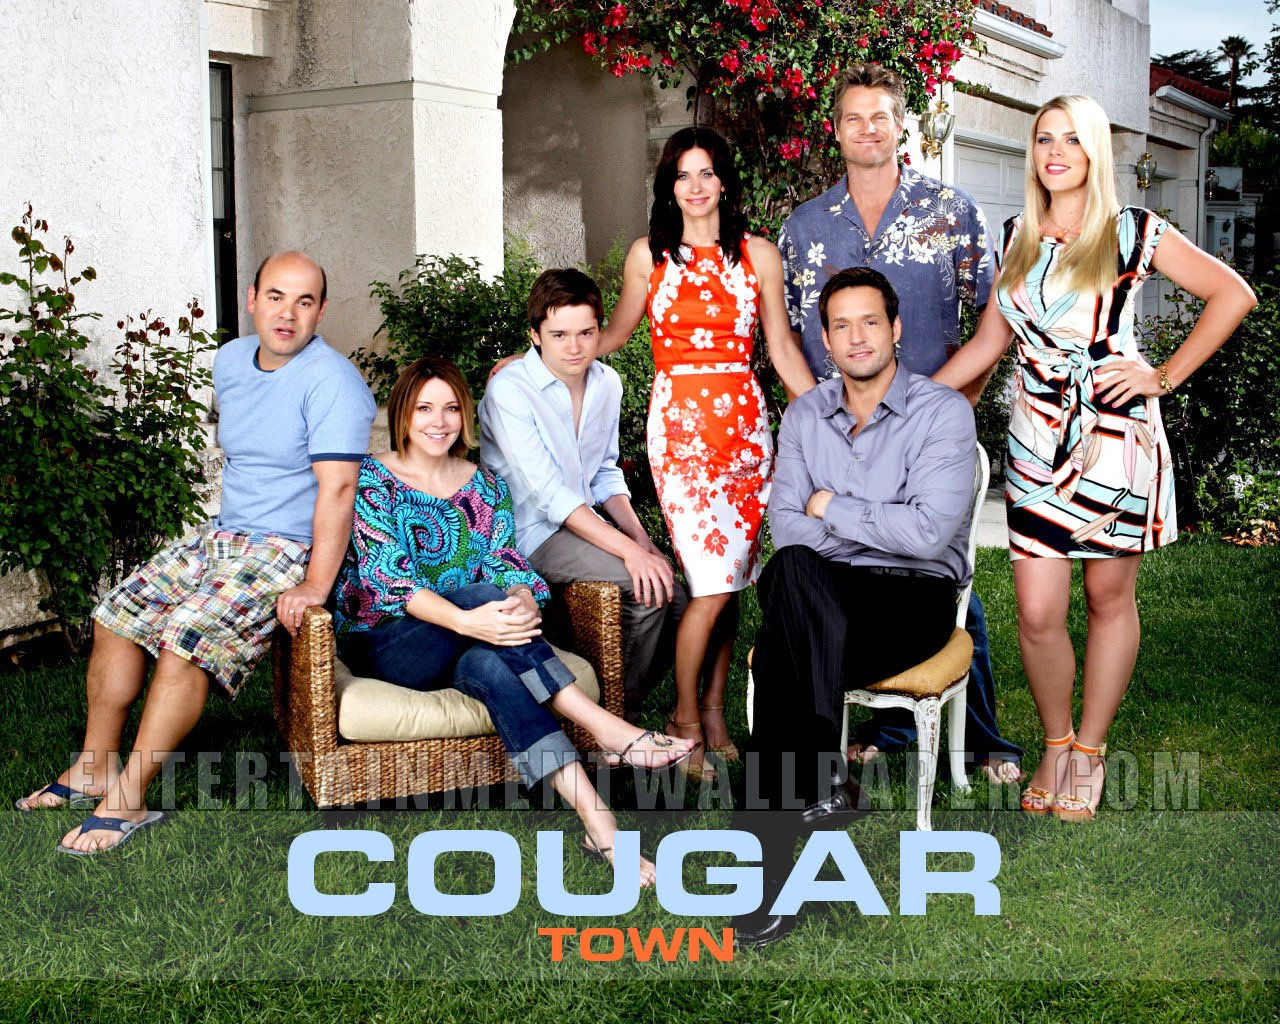 http://2.bp.blogspot.com/_l1vW1F-9WTY/SwikO0qcdFI/AAAAAAAAAQg/Dj6DbF0Rxys/s1600/cougar_town01.jpg